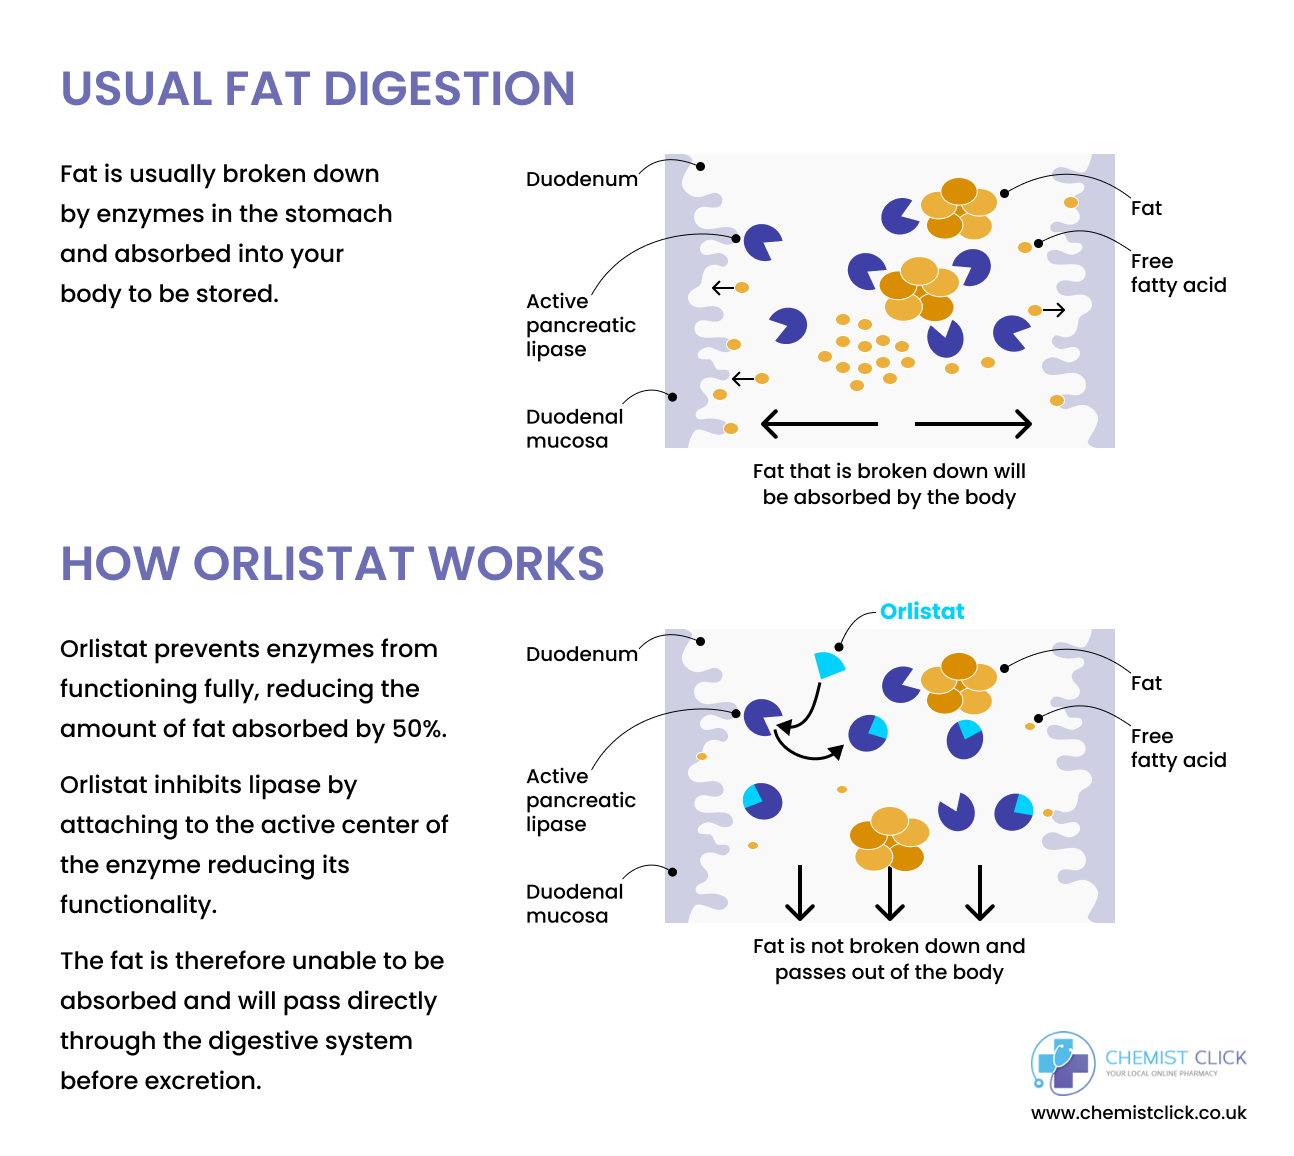 Orlistat mechanism of action